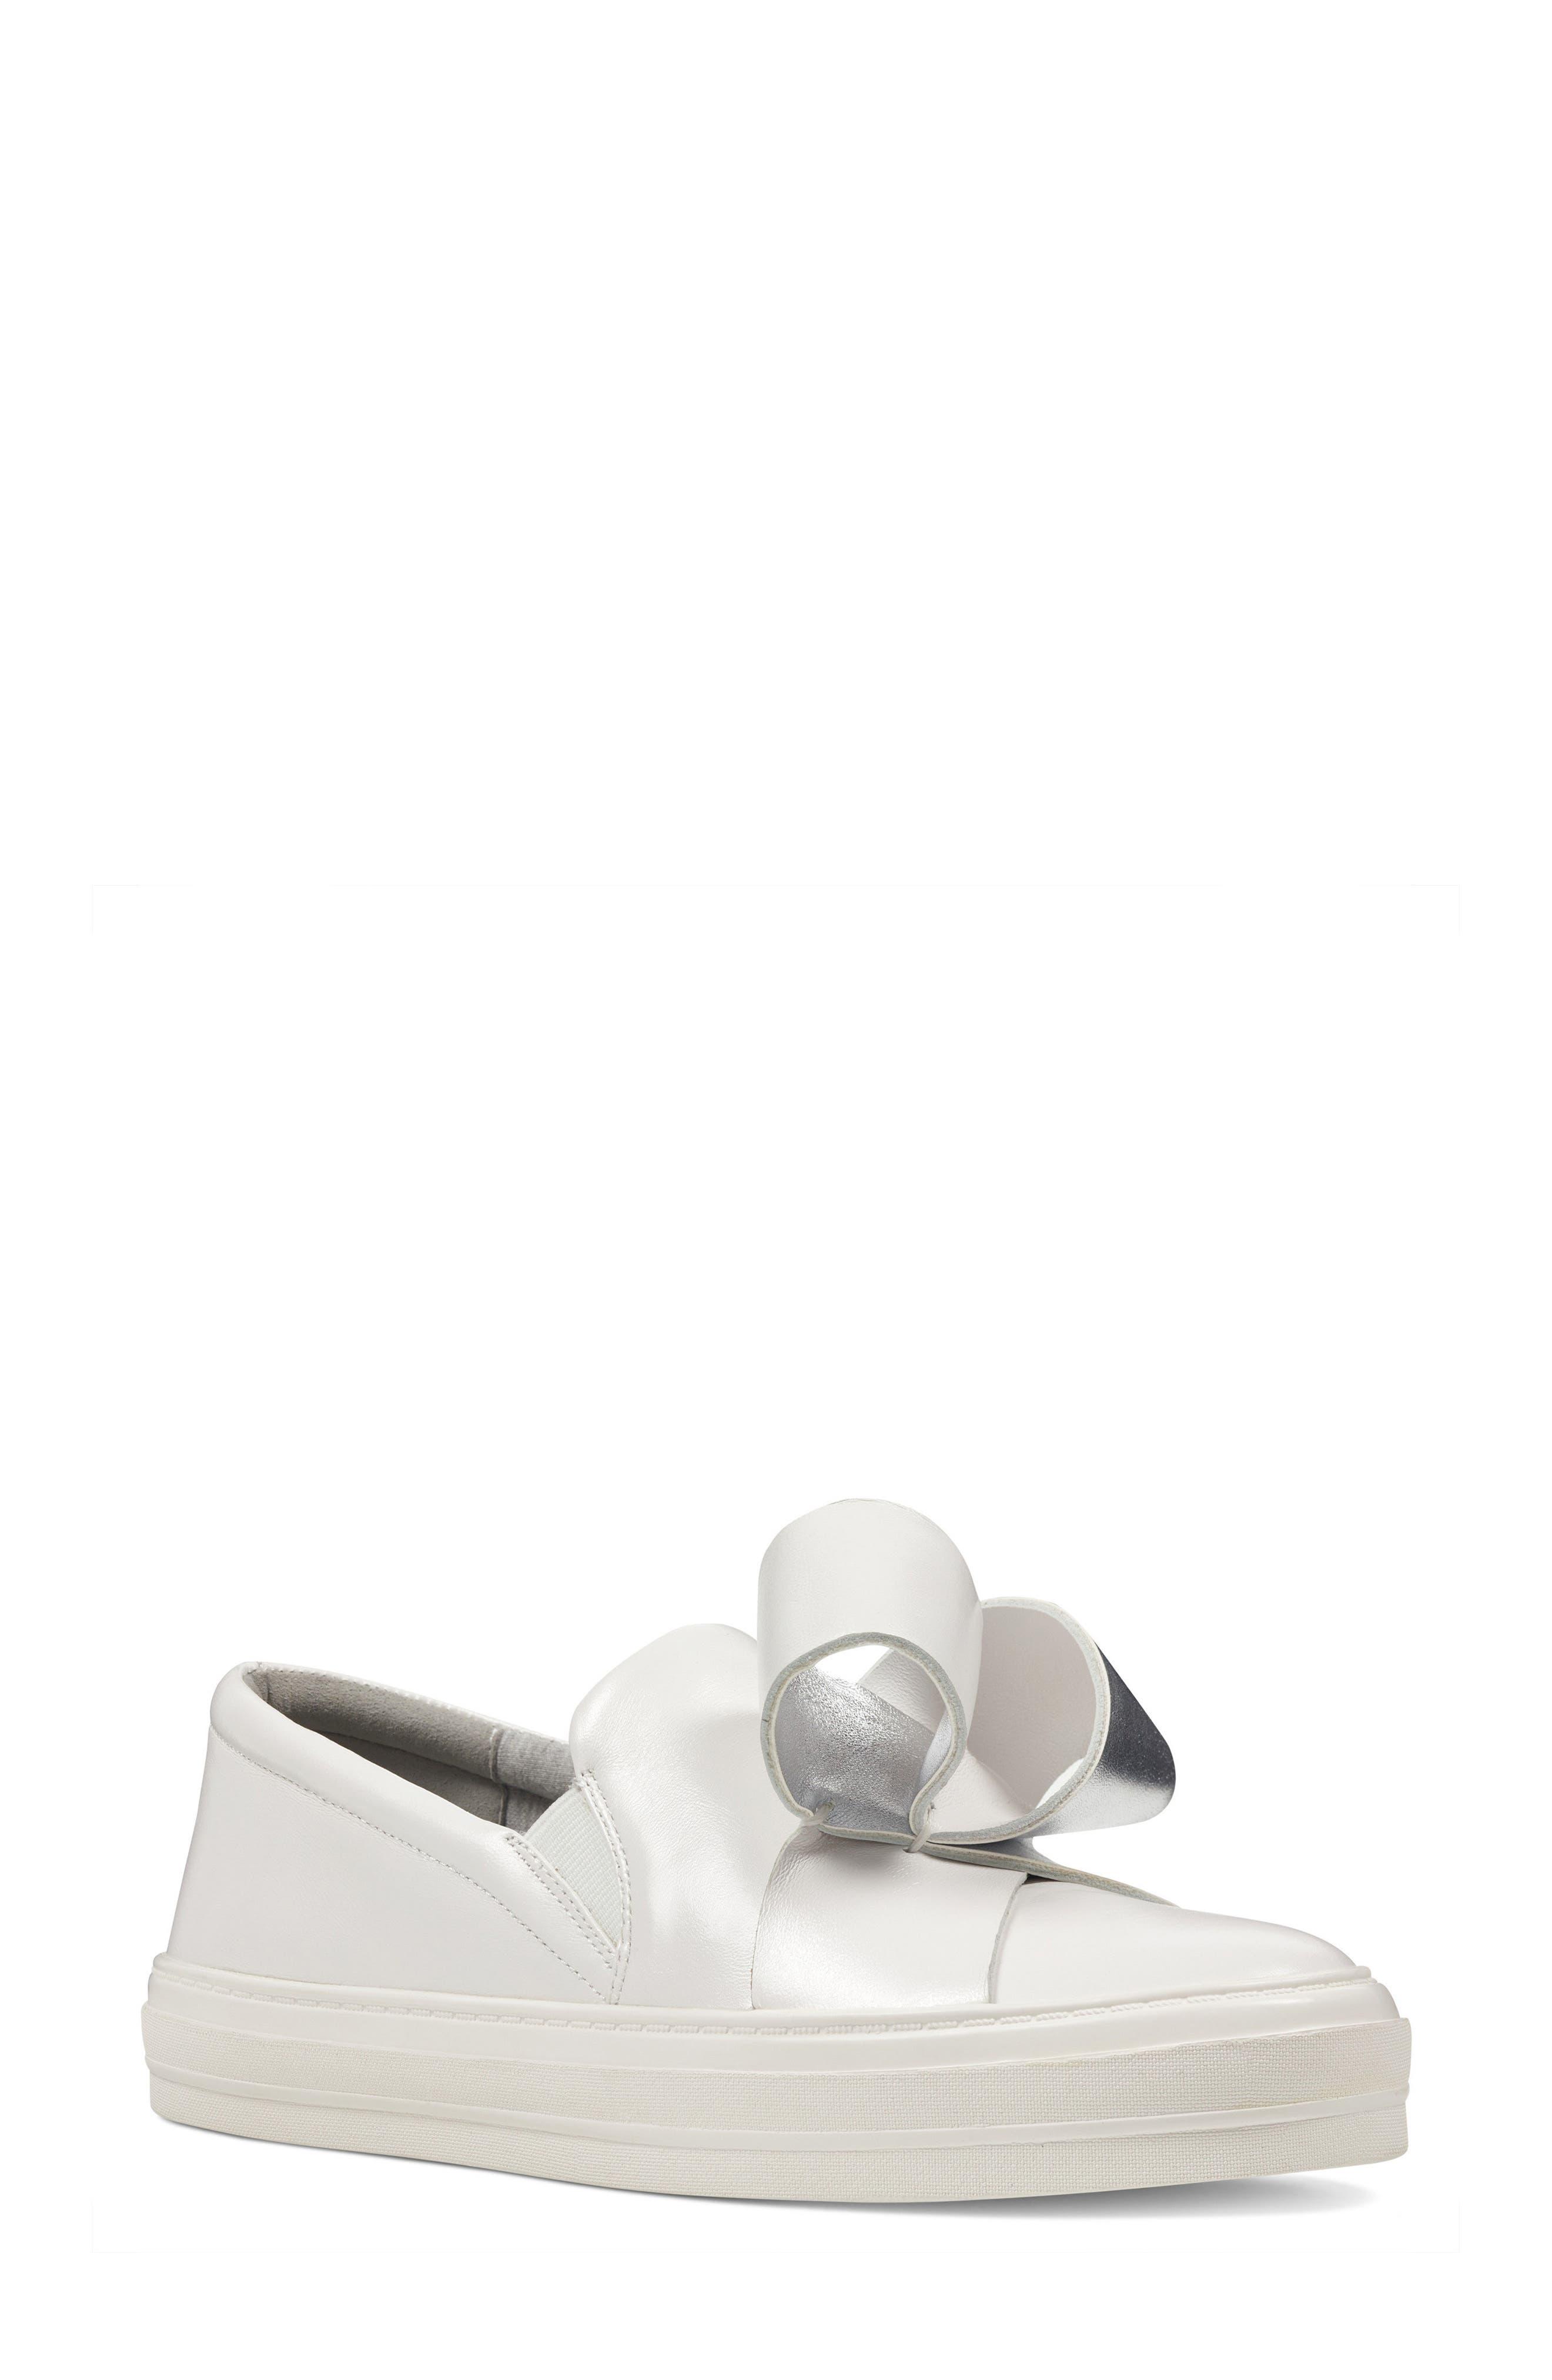 Odienella Slip-On Sneaker,                             Main thumbnail 1, color,                             White Multi Leather